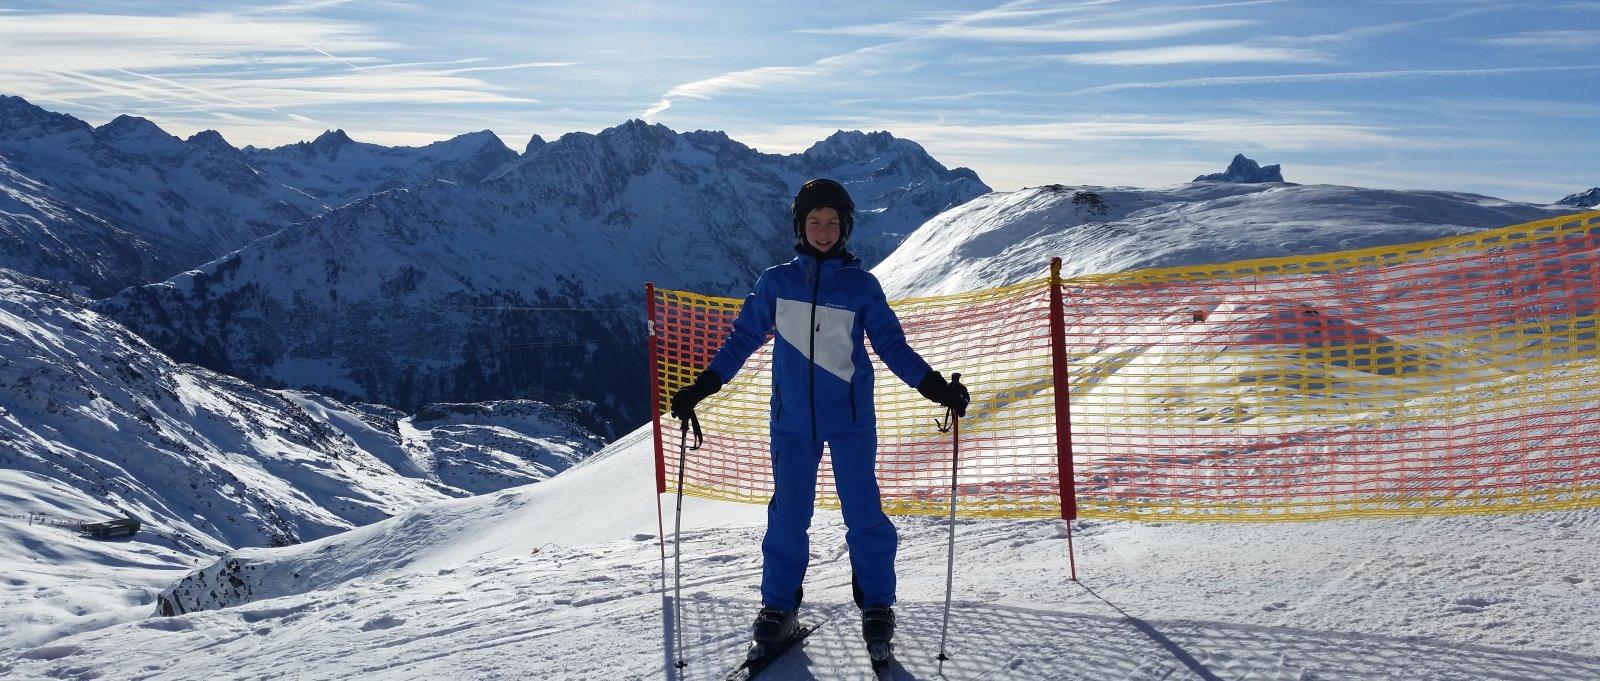 skifahren-deutschland-skikurse-alpen-berge-skiausflug